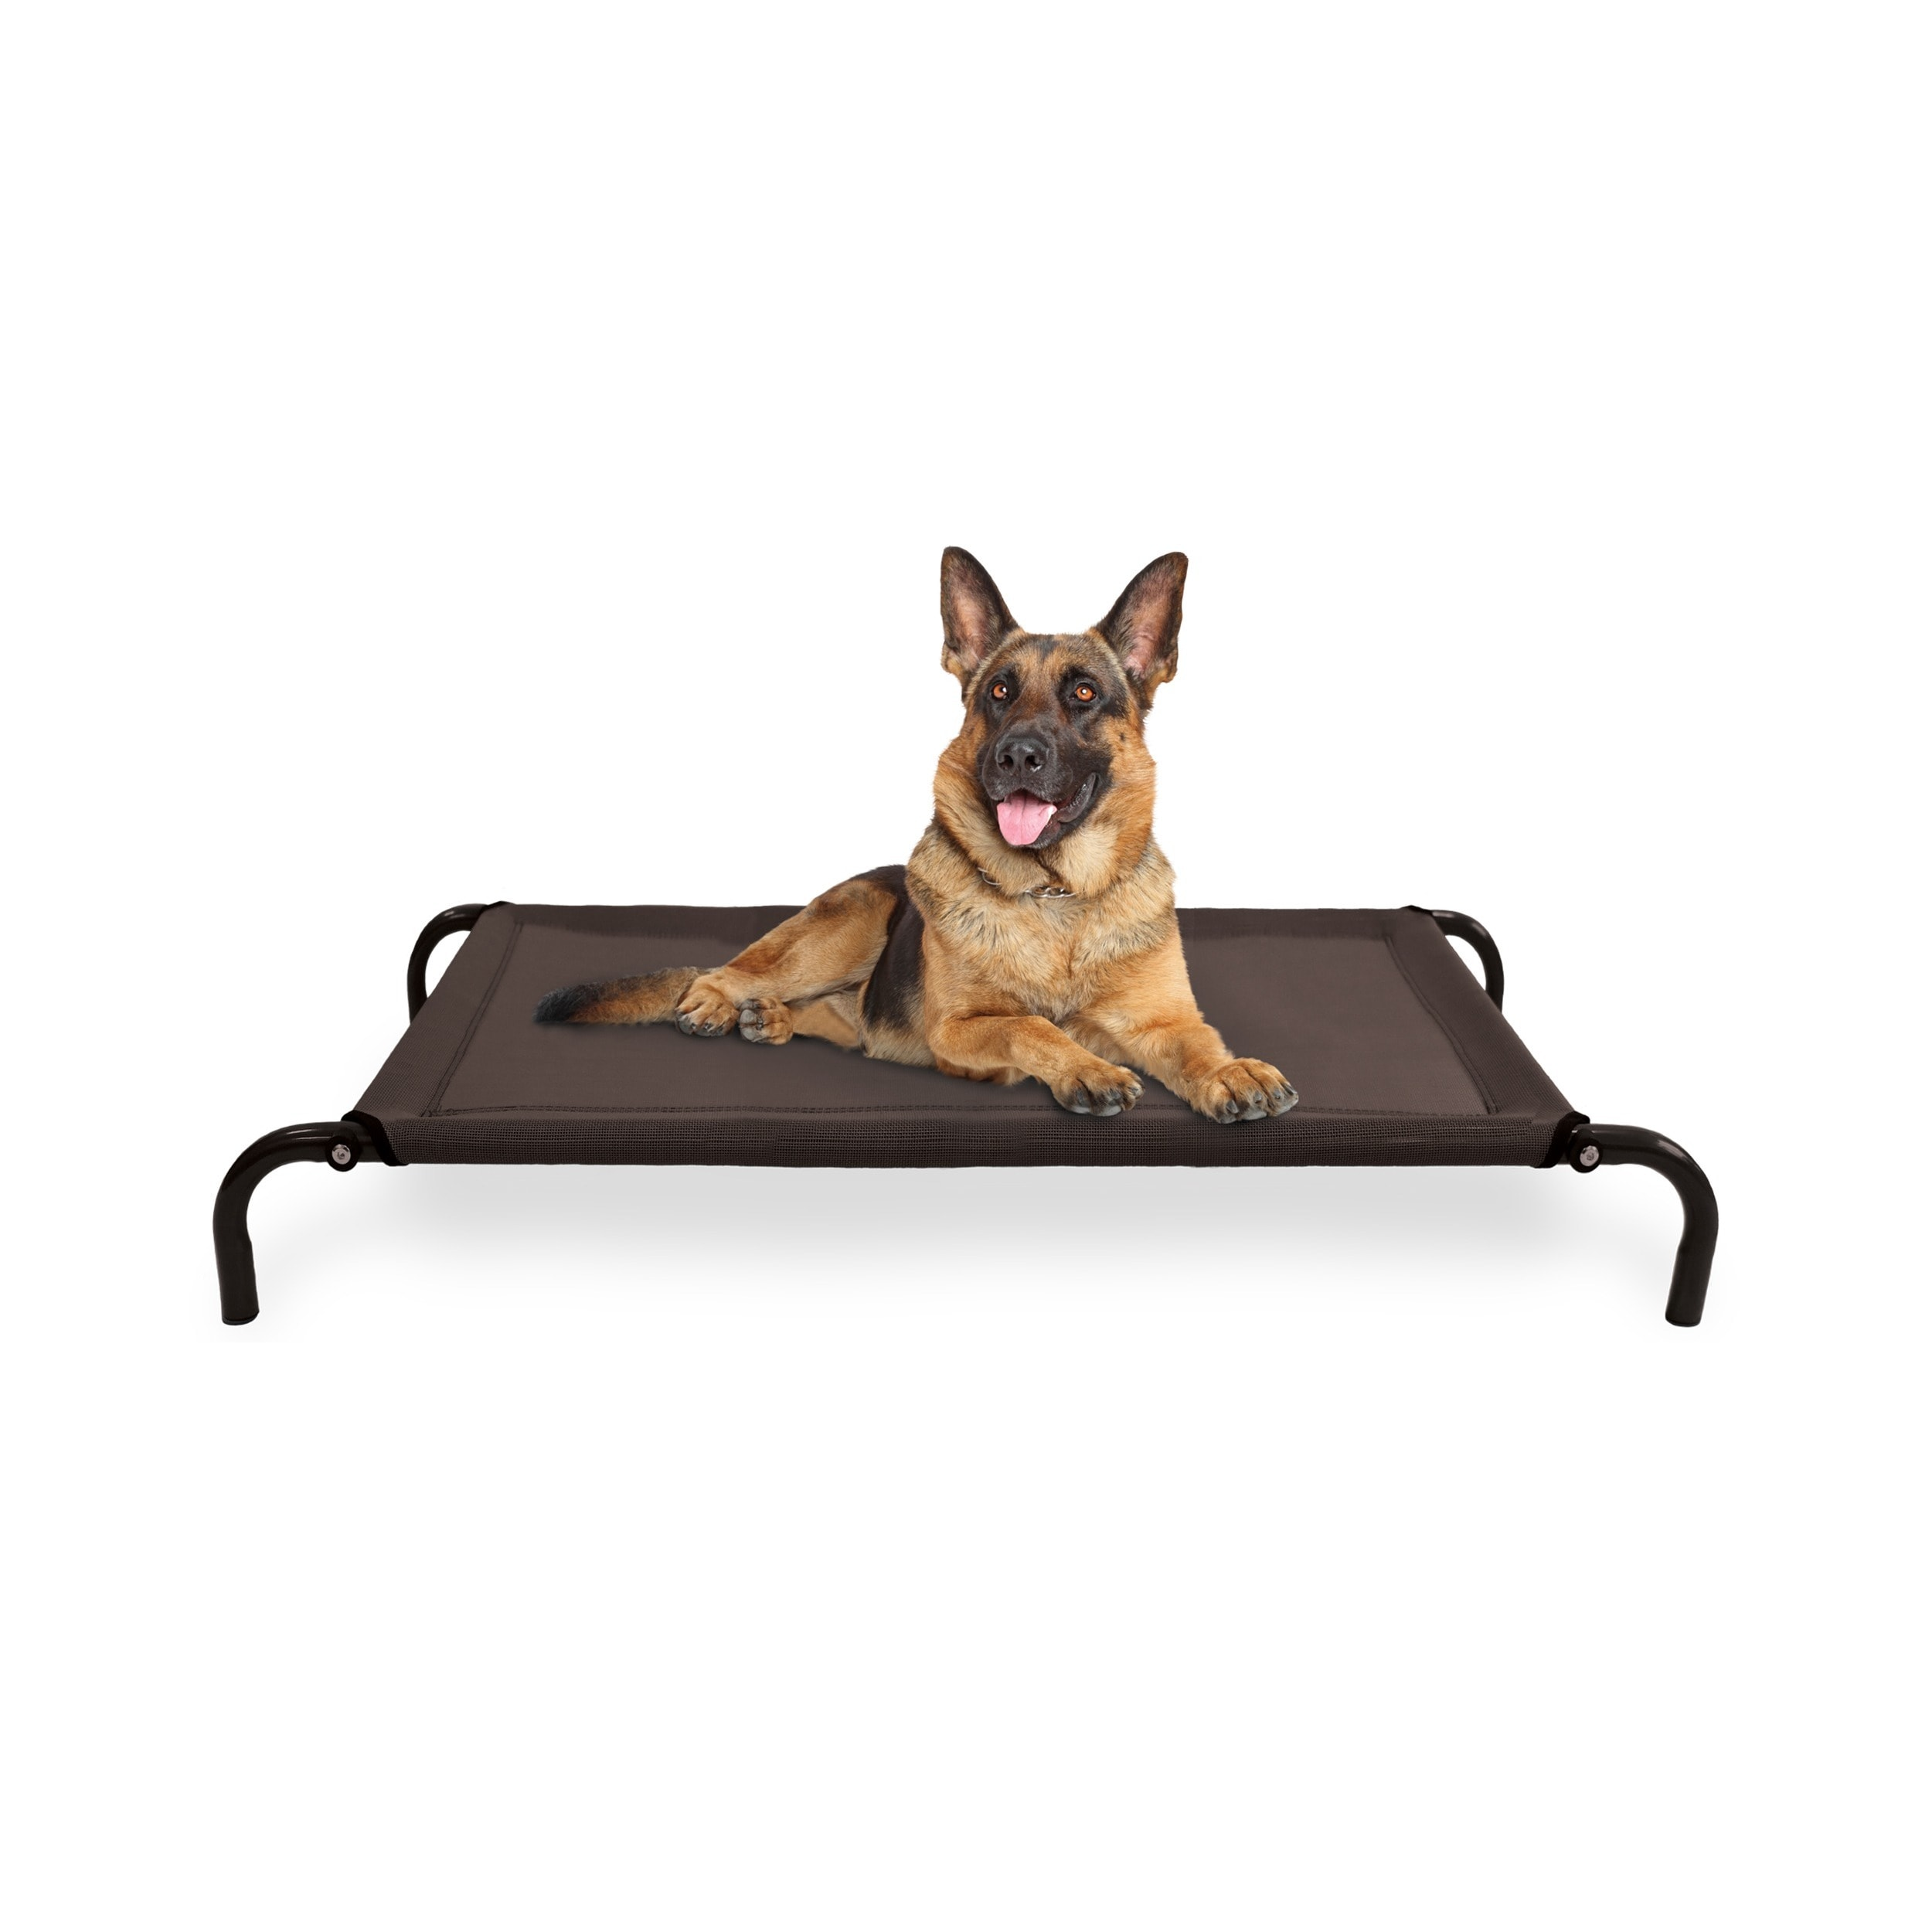 radiator cat hammoc wooden dog hammock b pine new supply diy hammocks classic d a the pet bed products car lazy